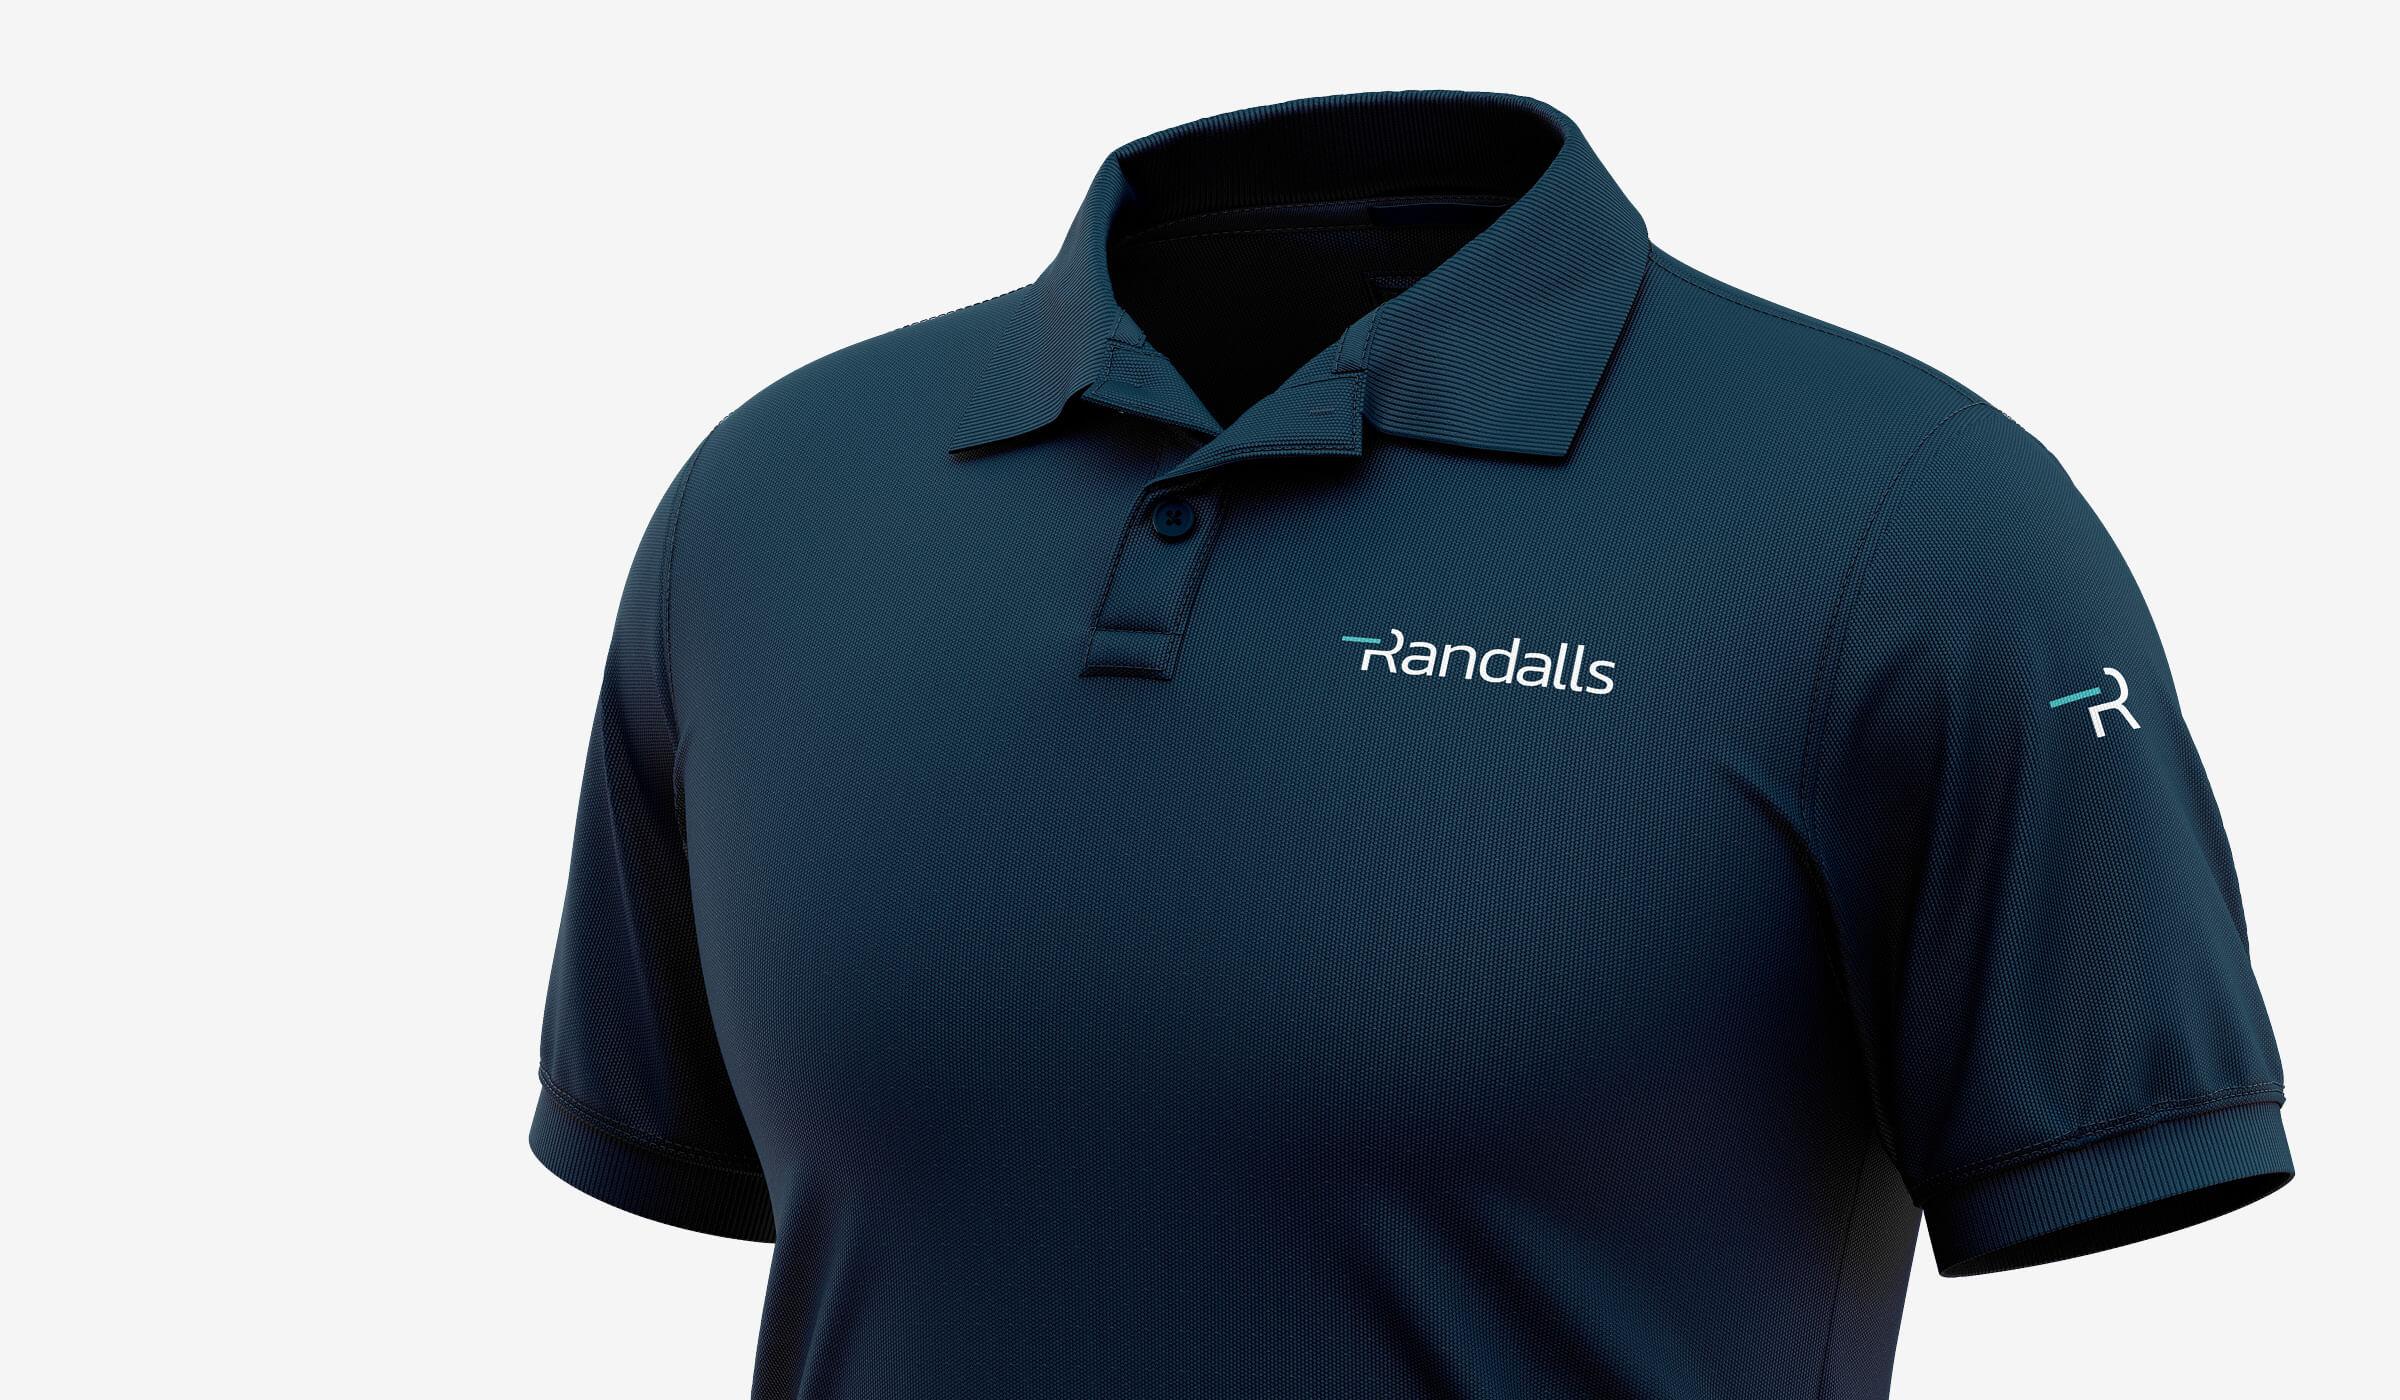 Randalls branded workwear